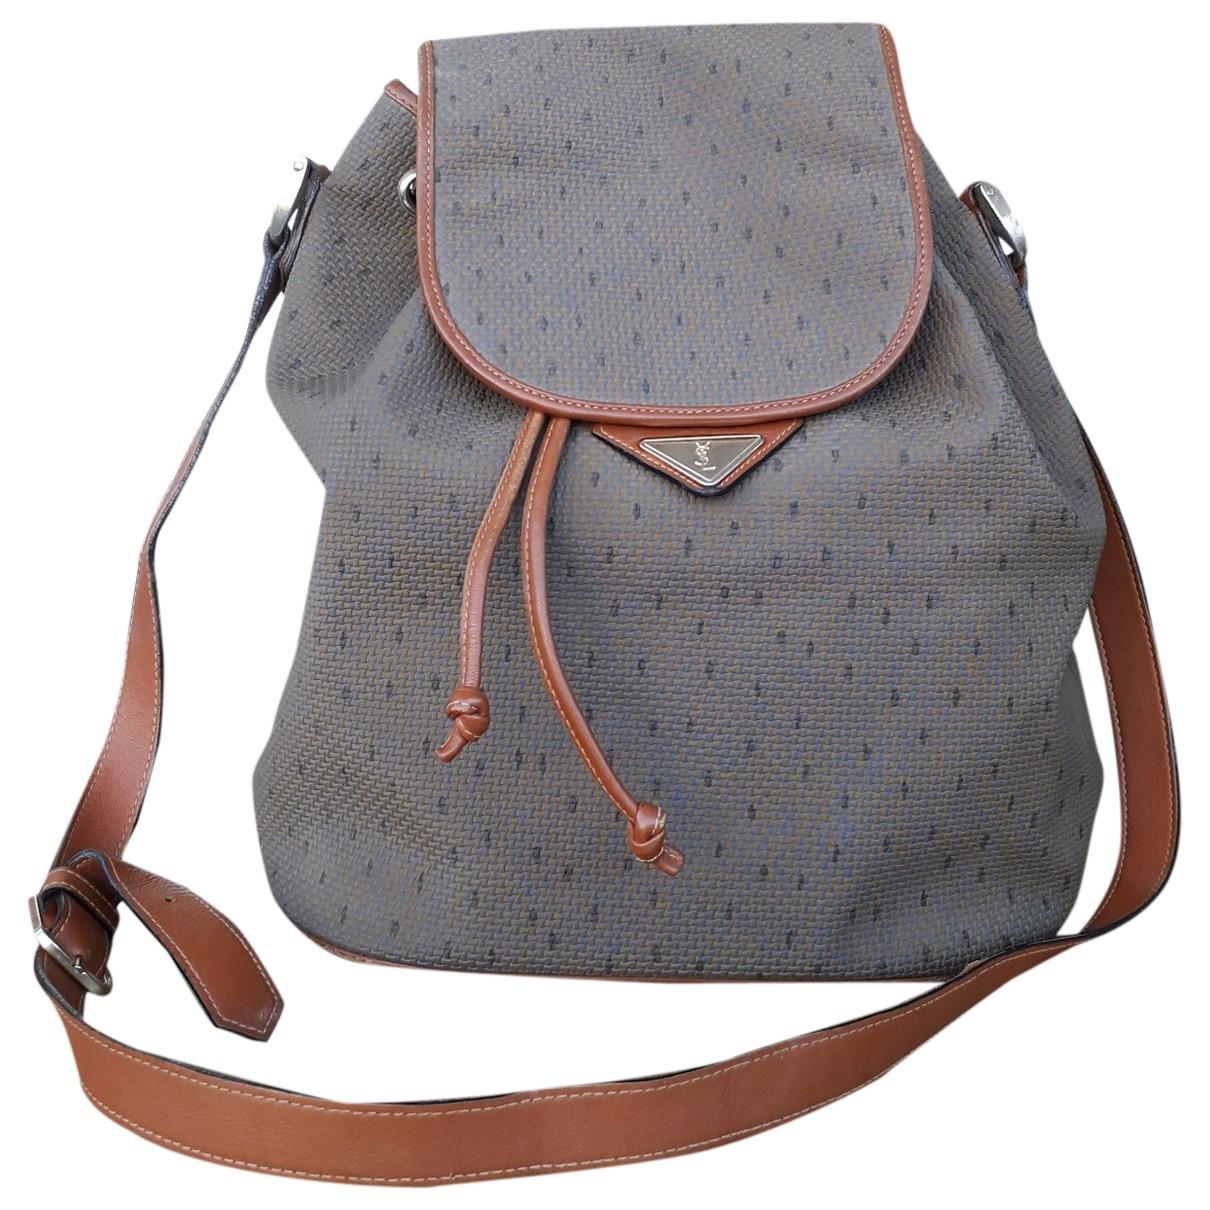 Yves Saint Laurent \N Brown Cloth handbag for Women \N